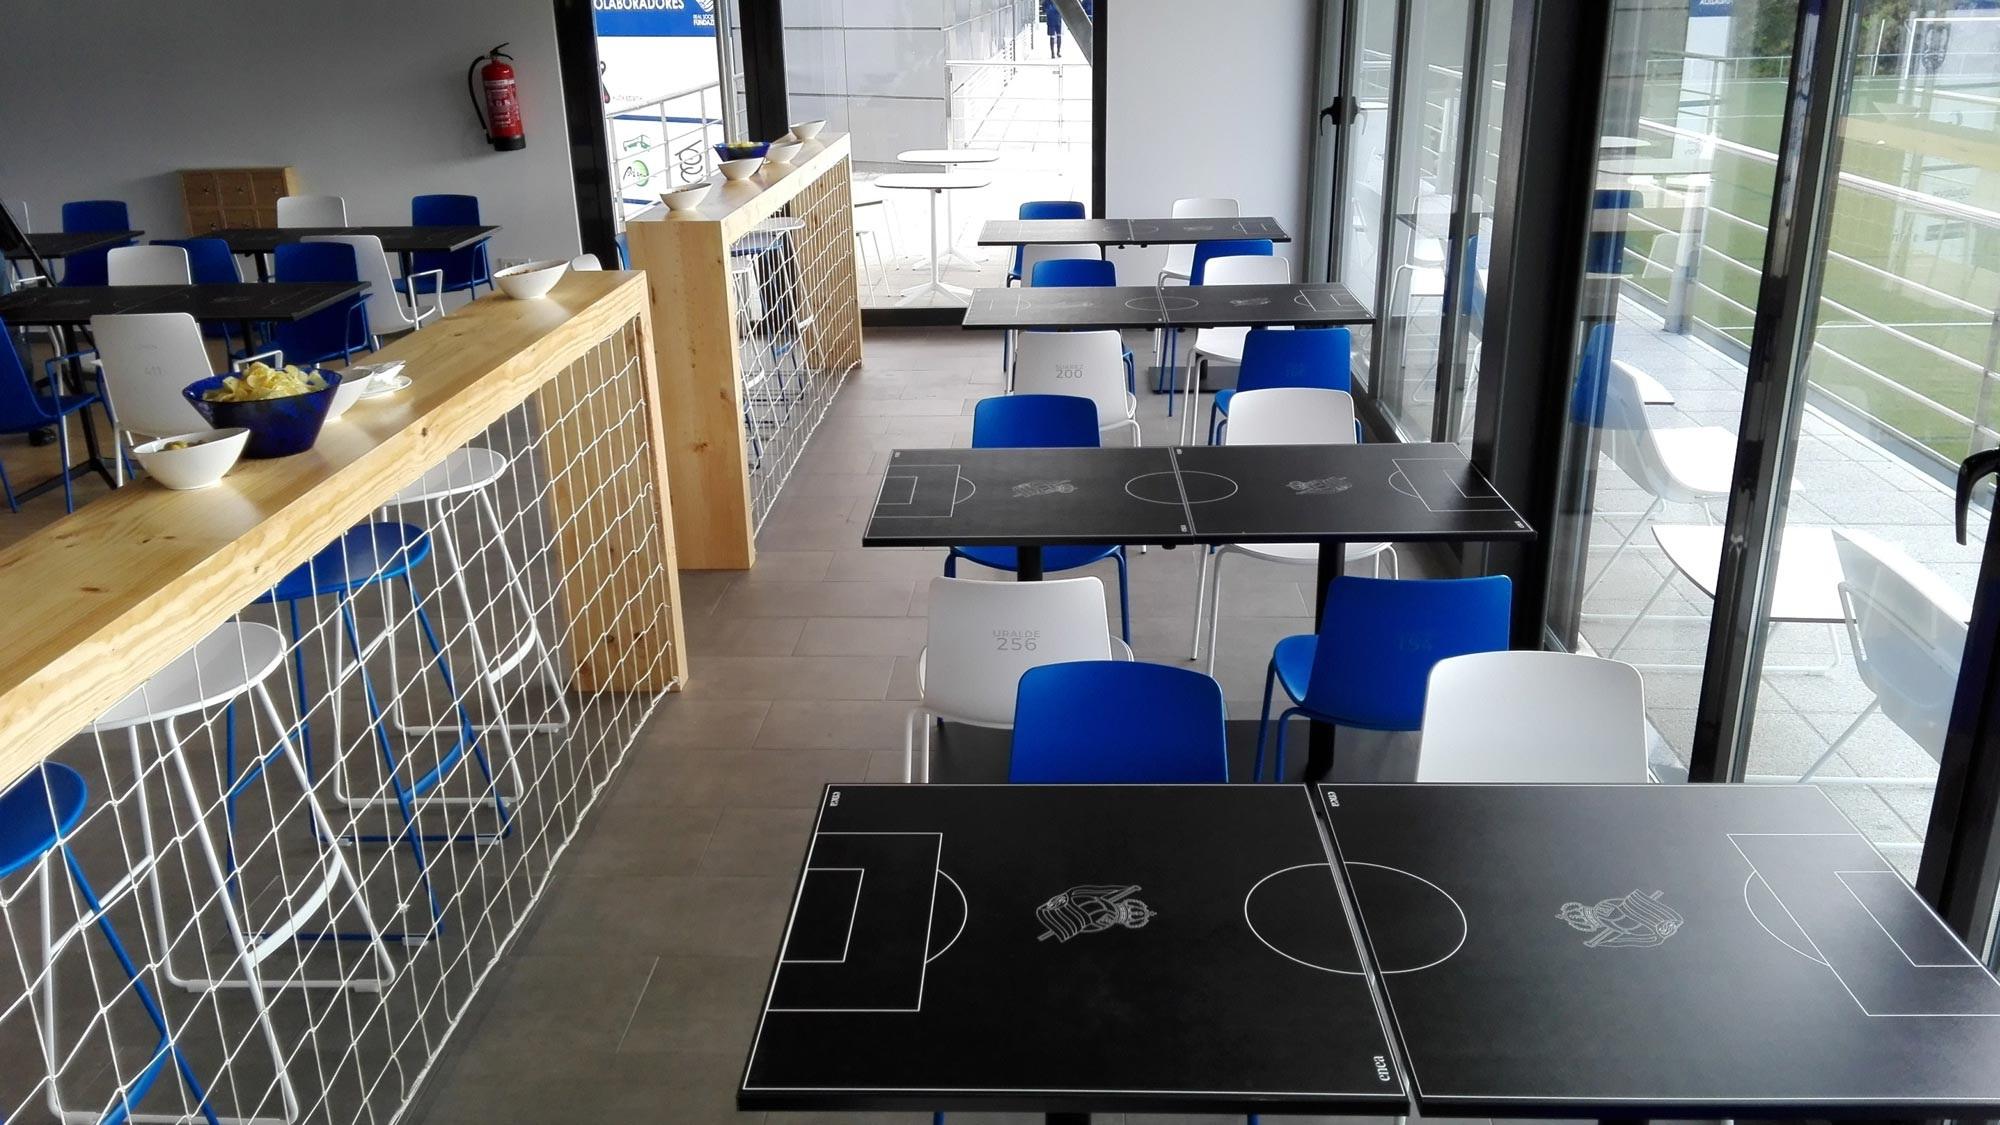 Harrobi bar real sociedad lottus enea design